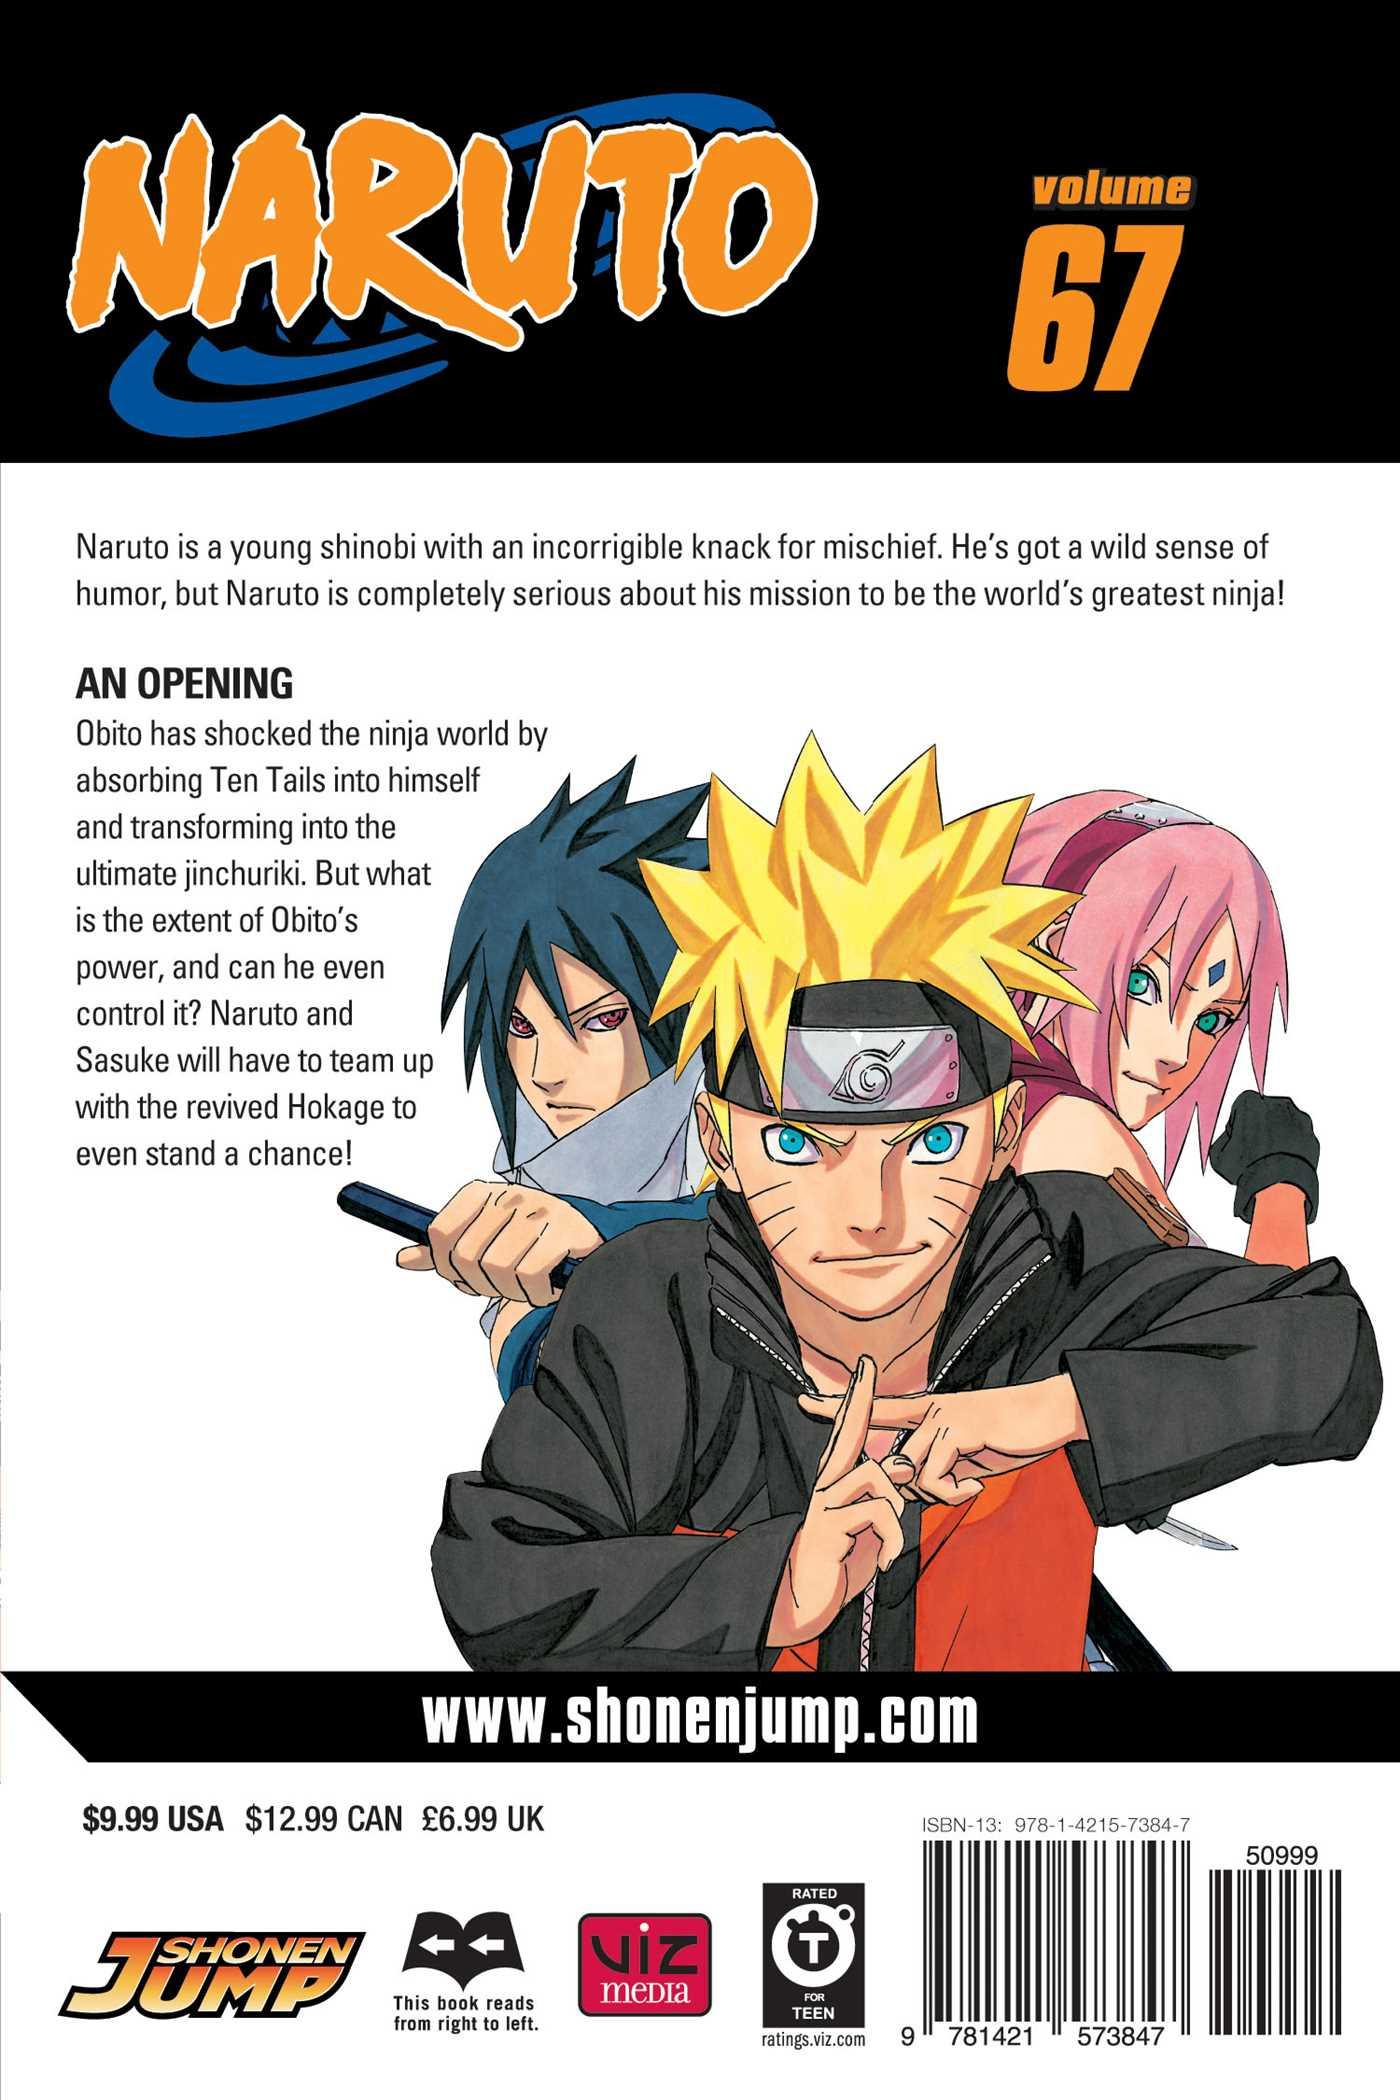 Naruto vol 67 9781421573847 hr back